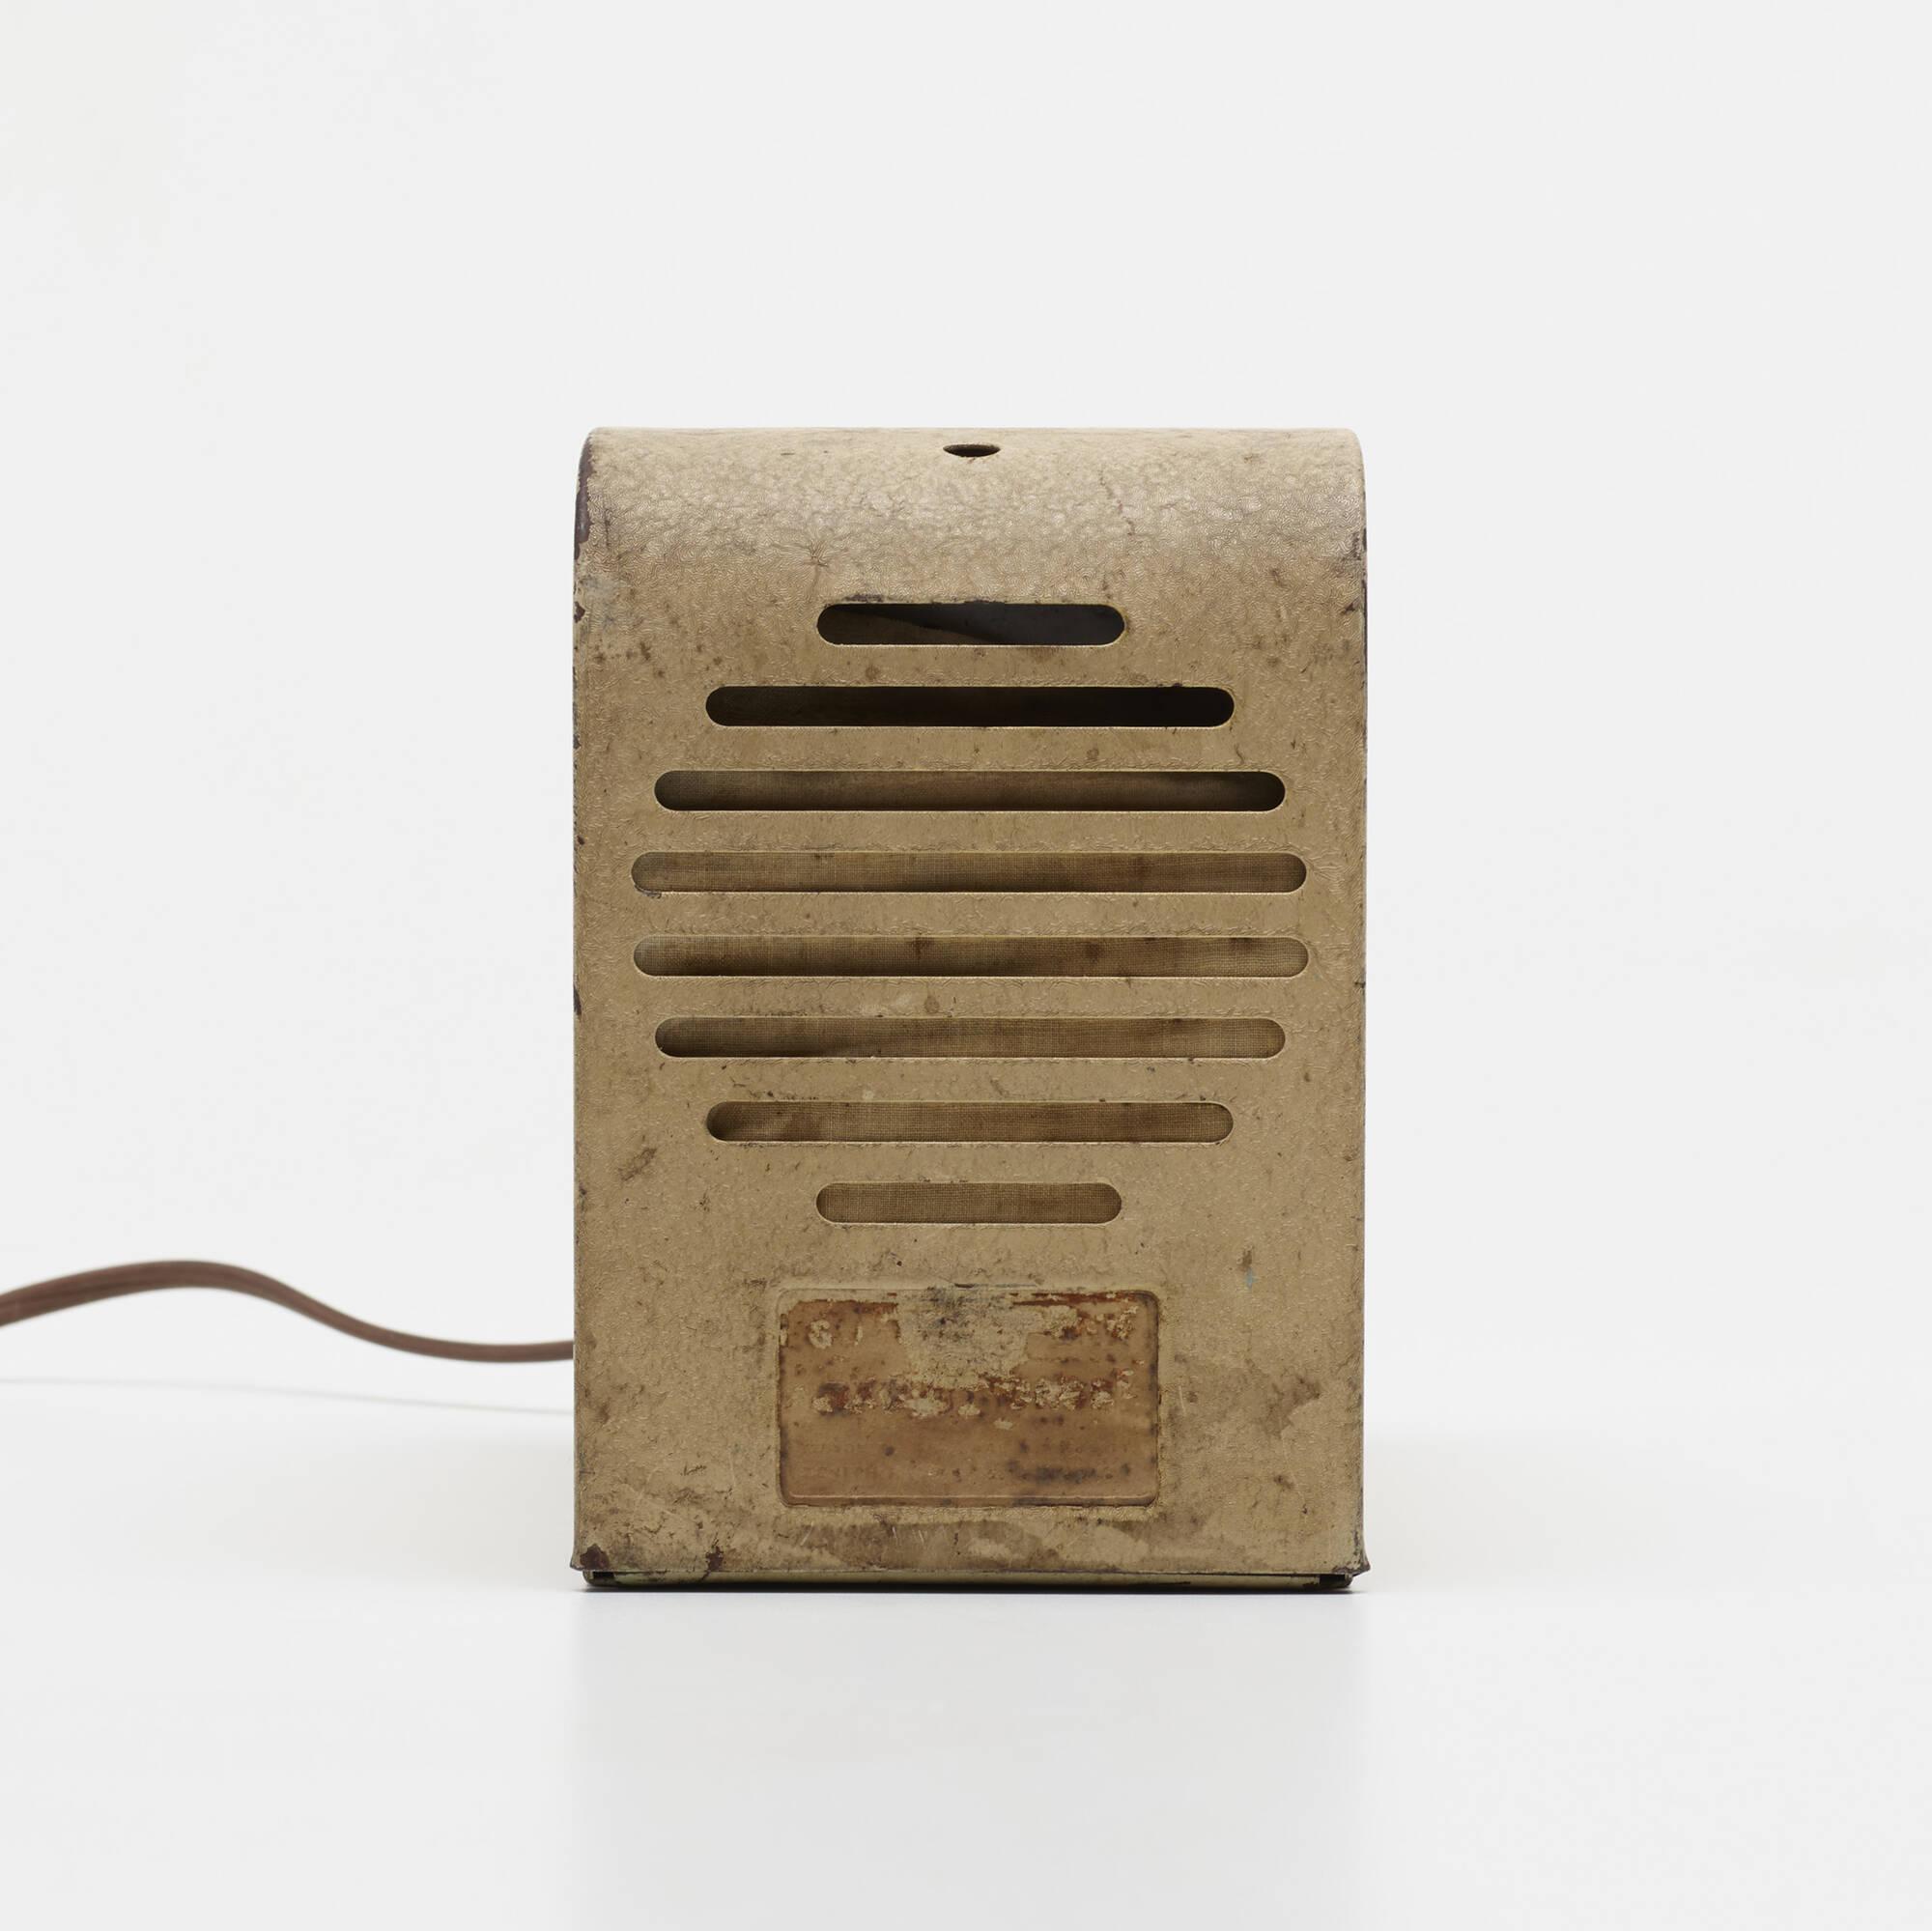 580: ISAMU NOGUCHI, Guardian Ear < Mass Modern - Day 2, 10 August ...